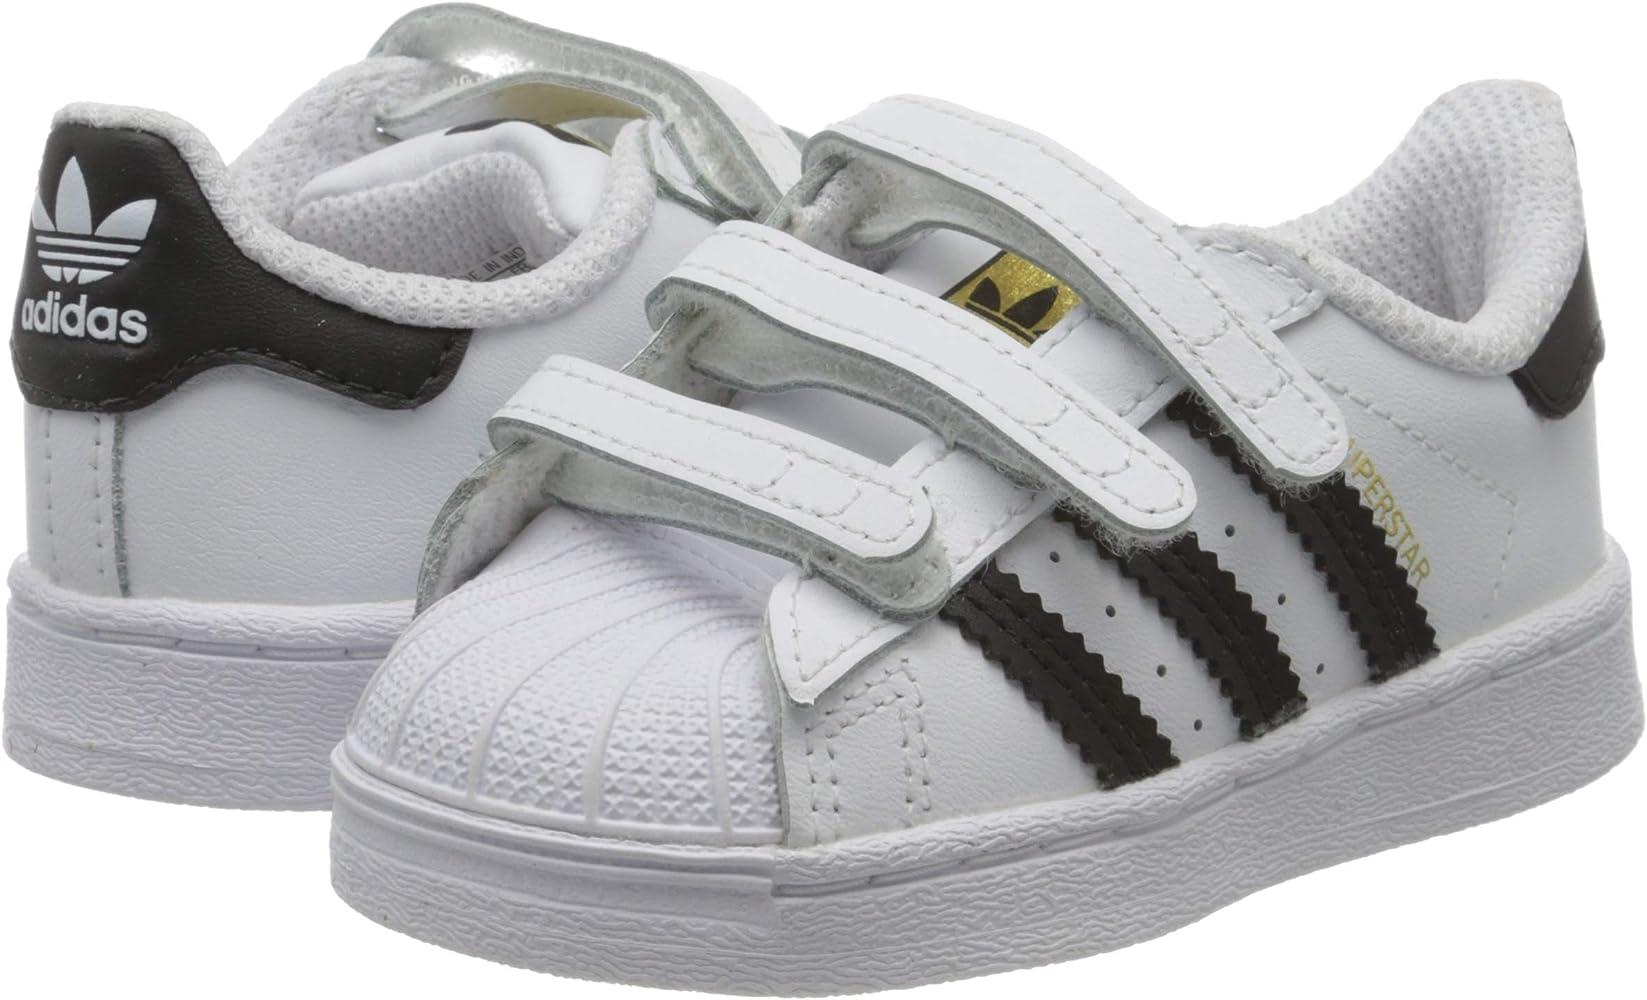 objetivo pagar El camarero  Amazon.com: adidas Unisex_Child Superstar CF I Sneaker, FTWR White Core  Black FTWR White, 9 UK: Shoes